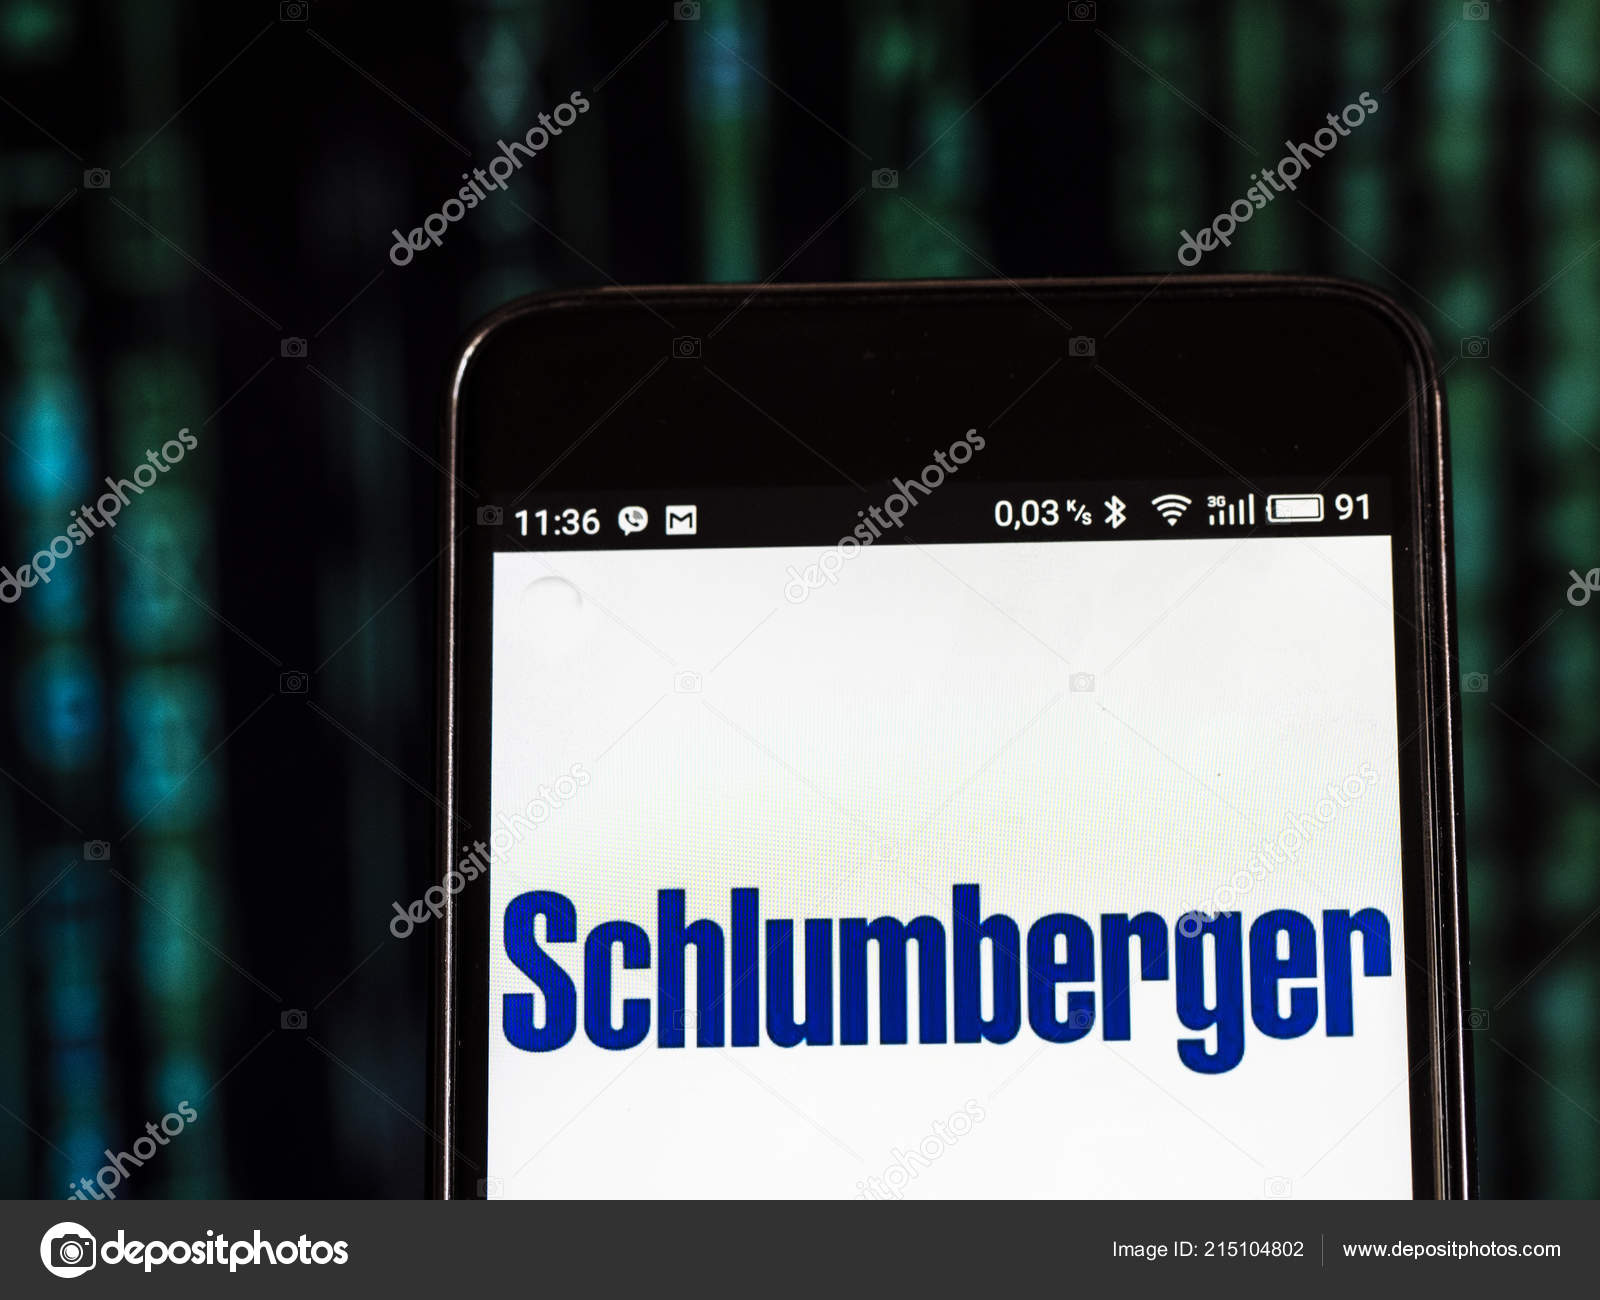 Schlumberger Limited Logo Seen Displayed Smart Phone